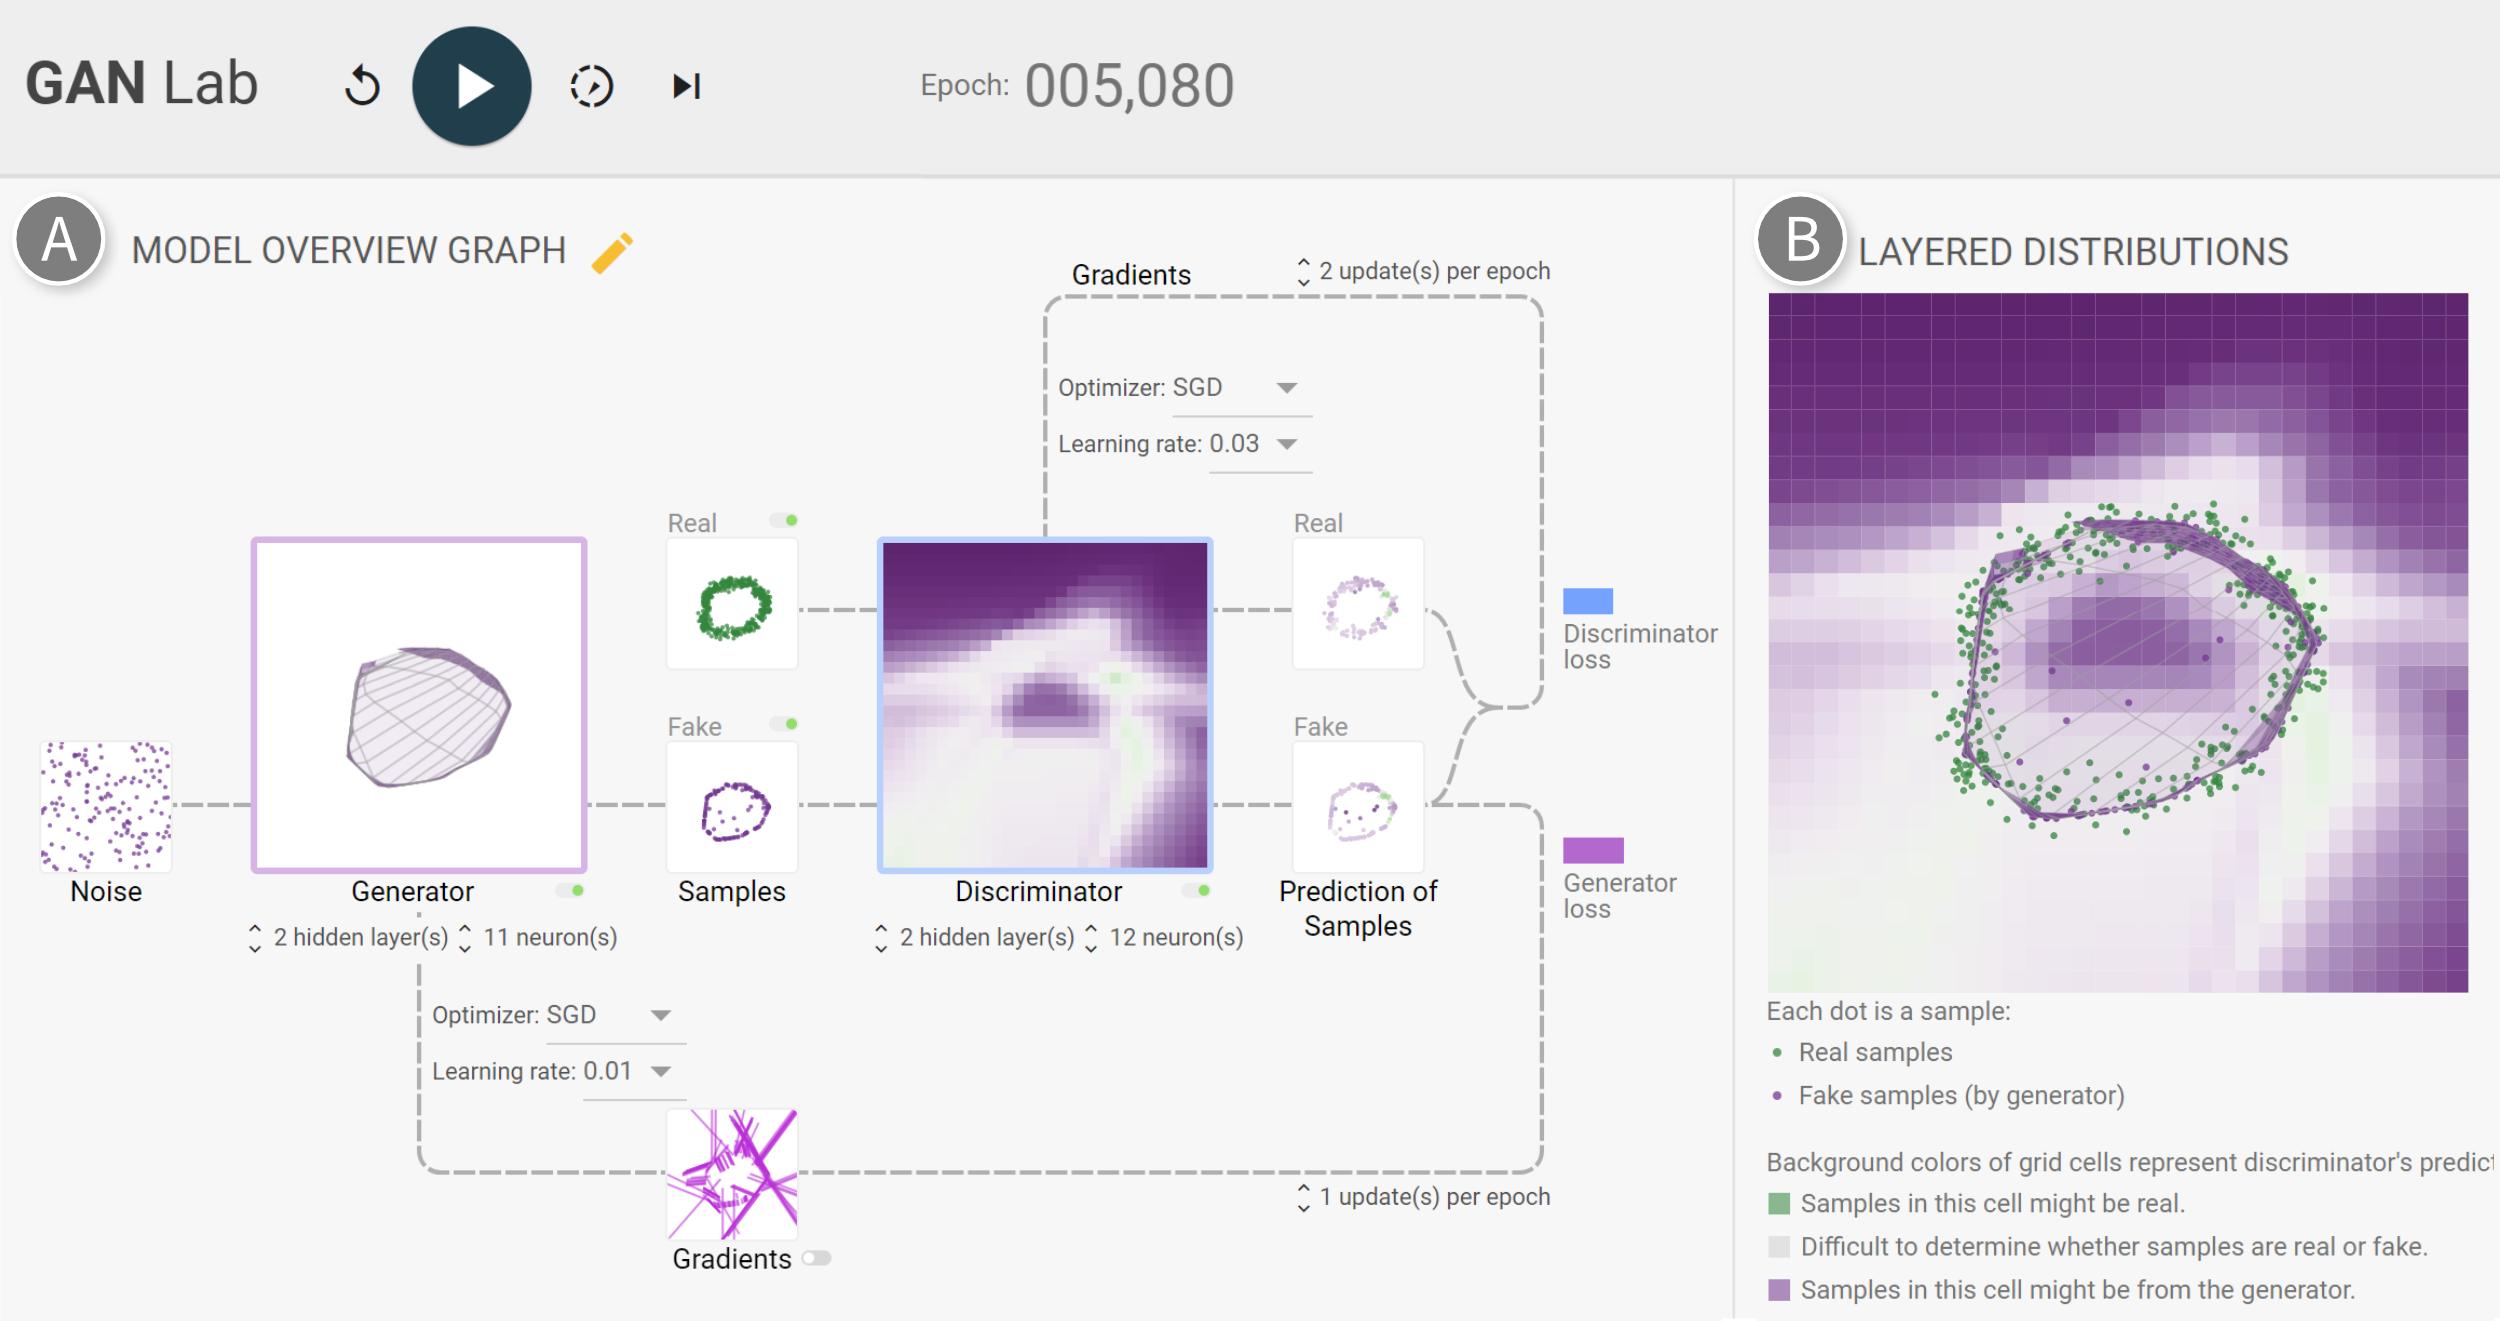 Screenshot of GAN Lab